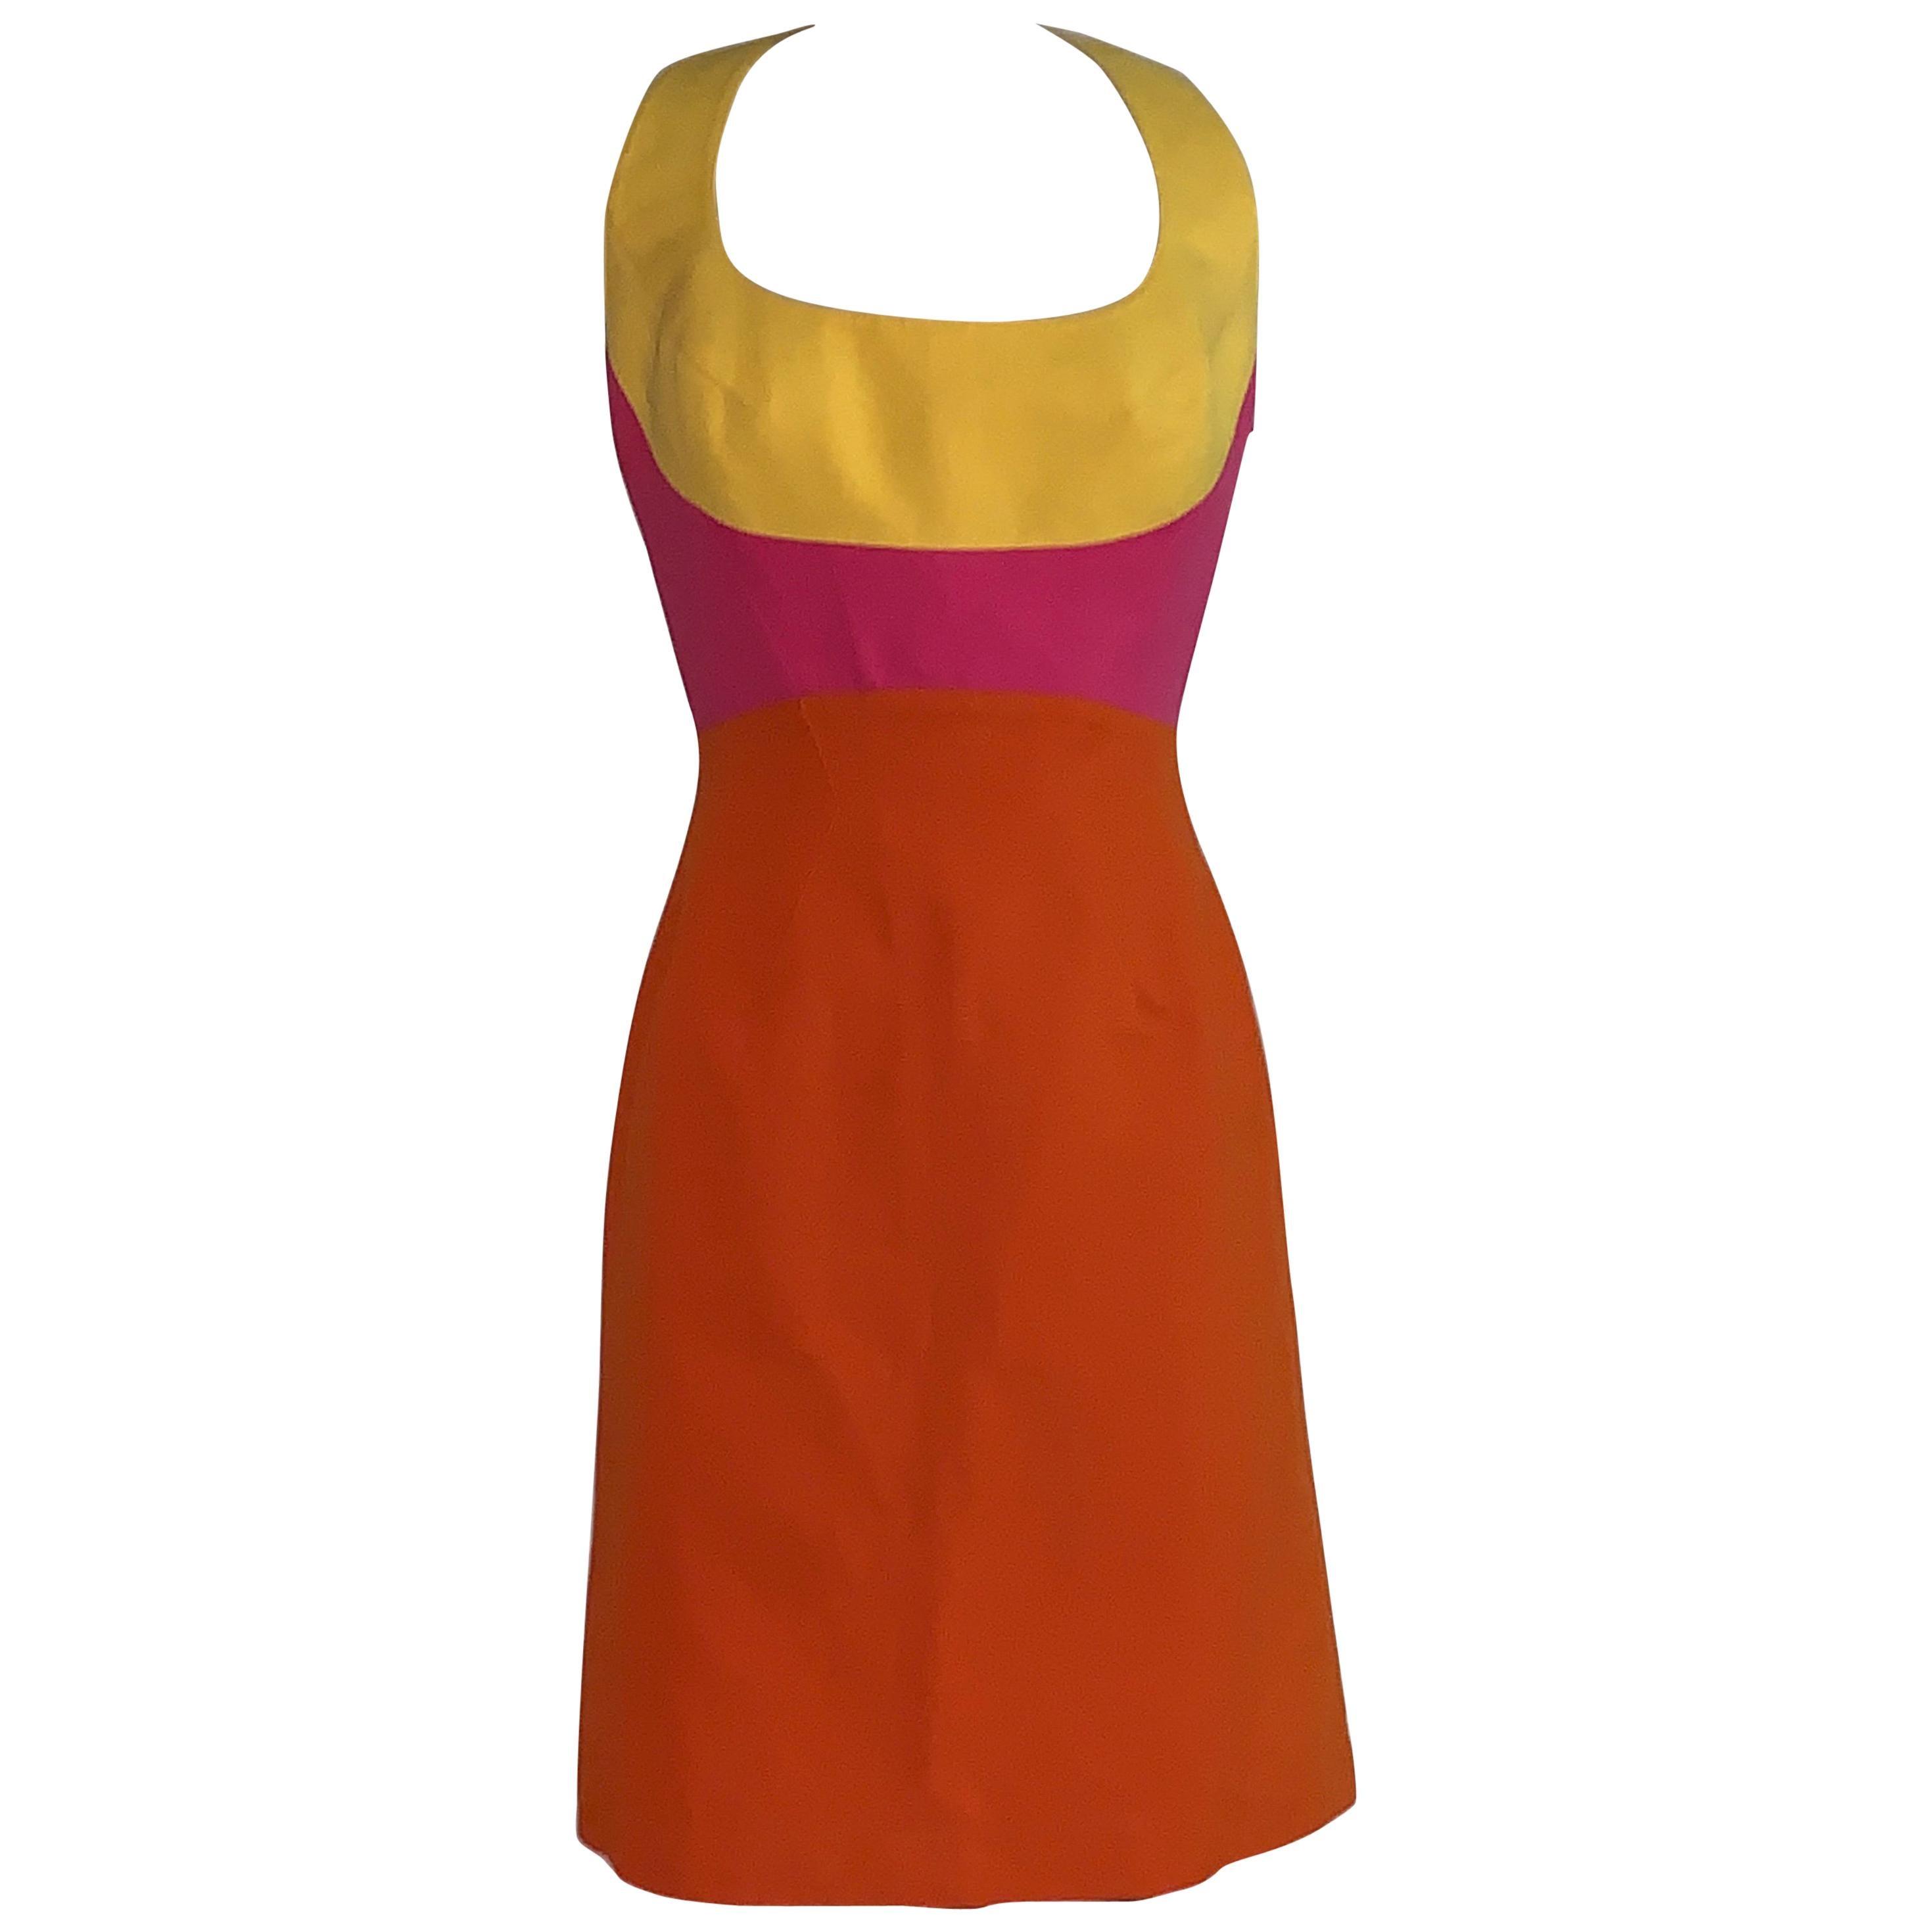 39186642a2f Vintage and Designer Clothing - 47